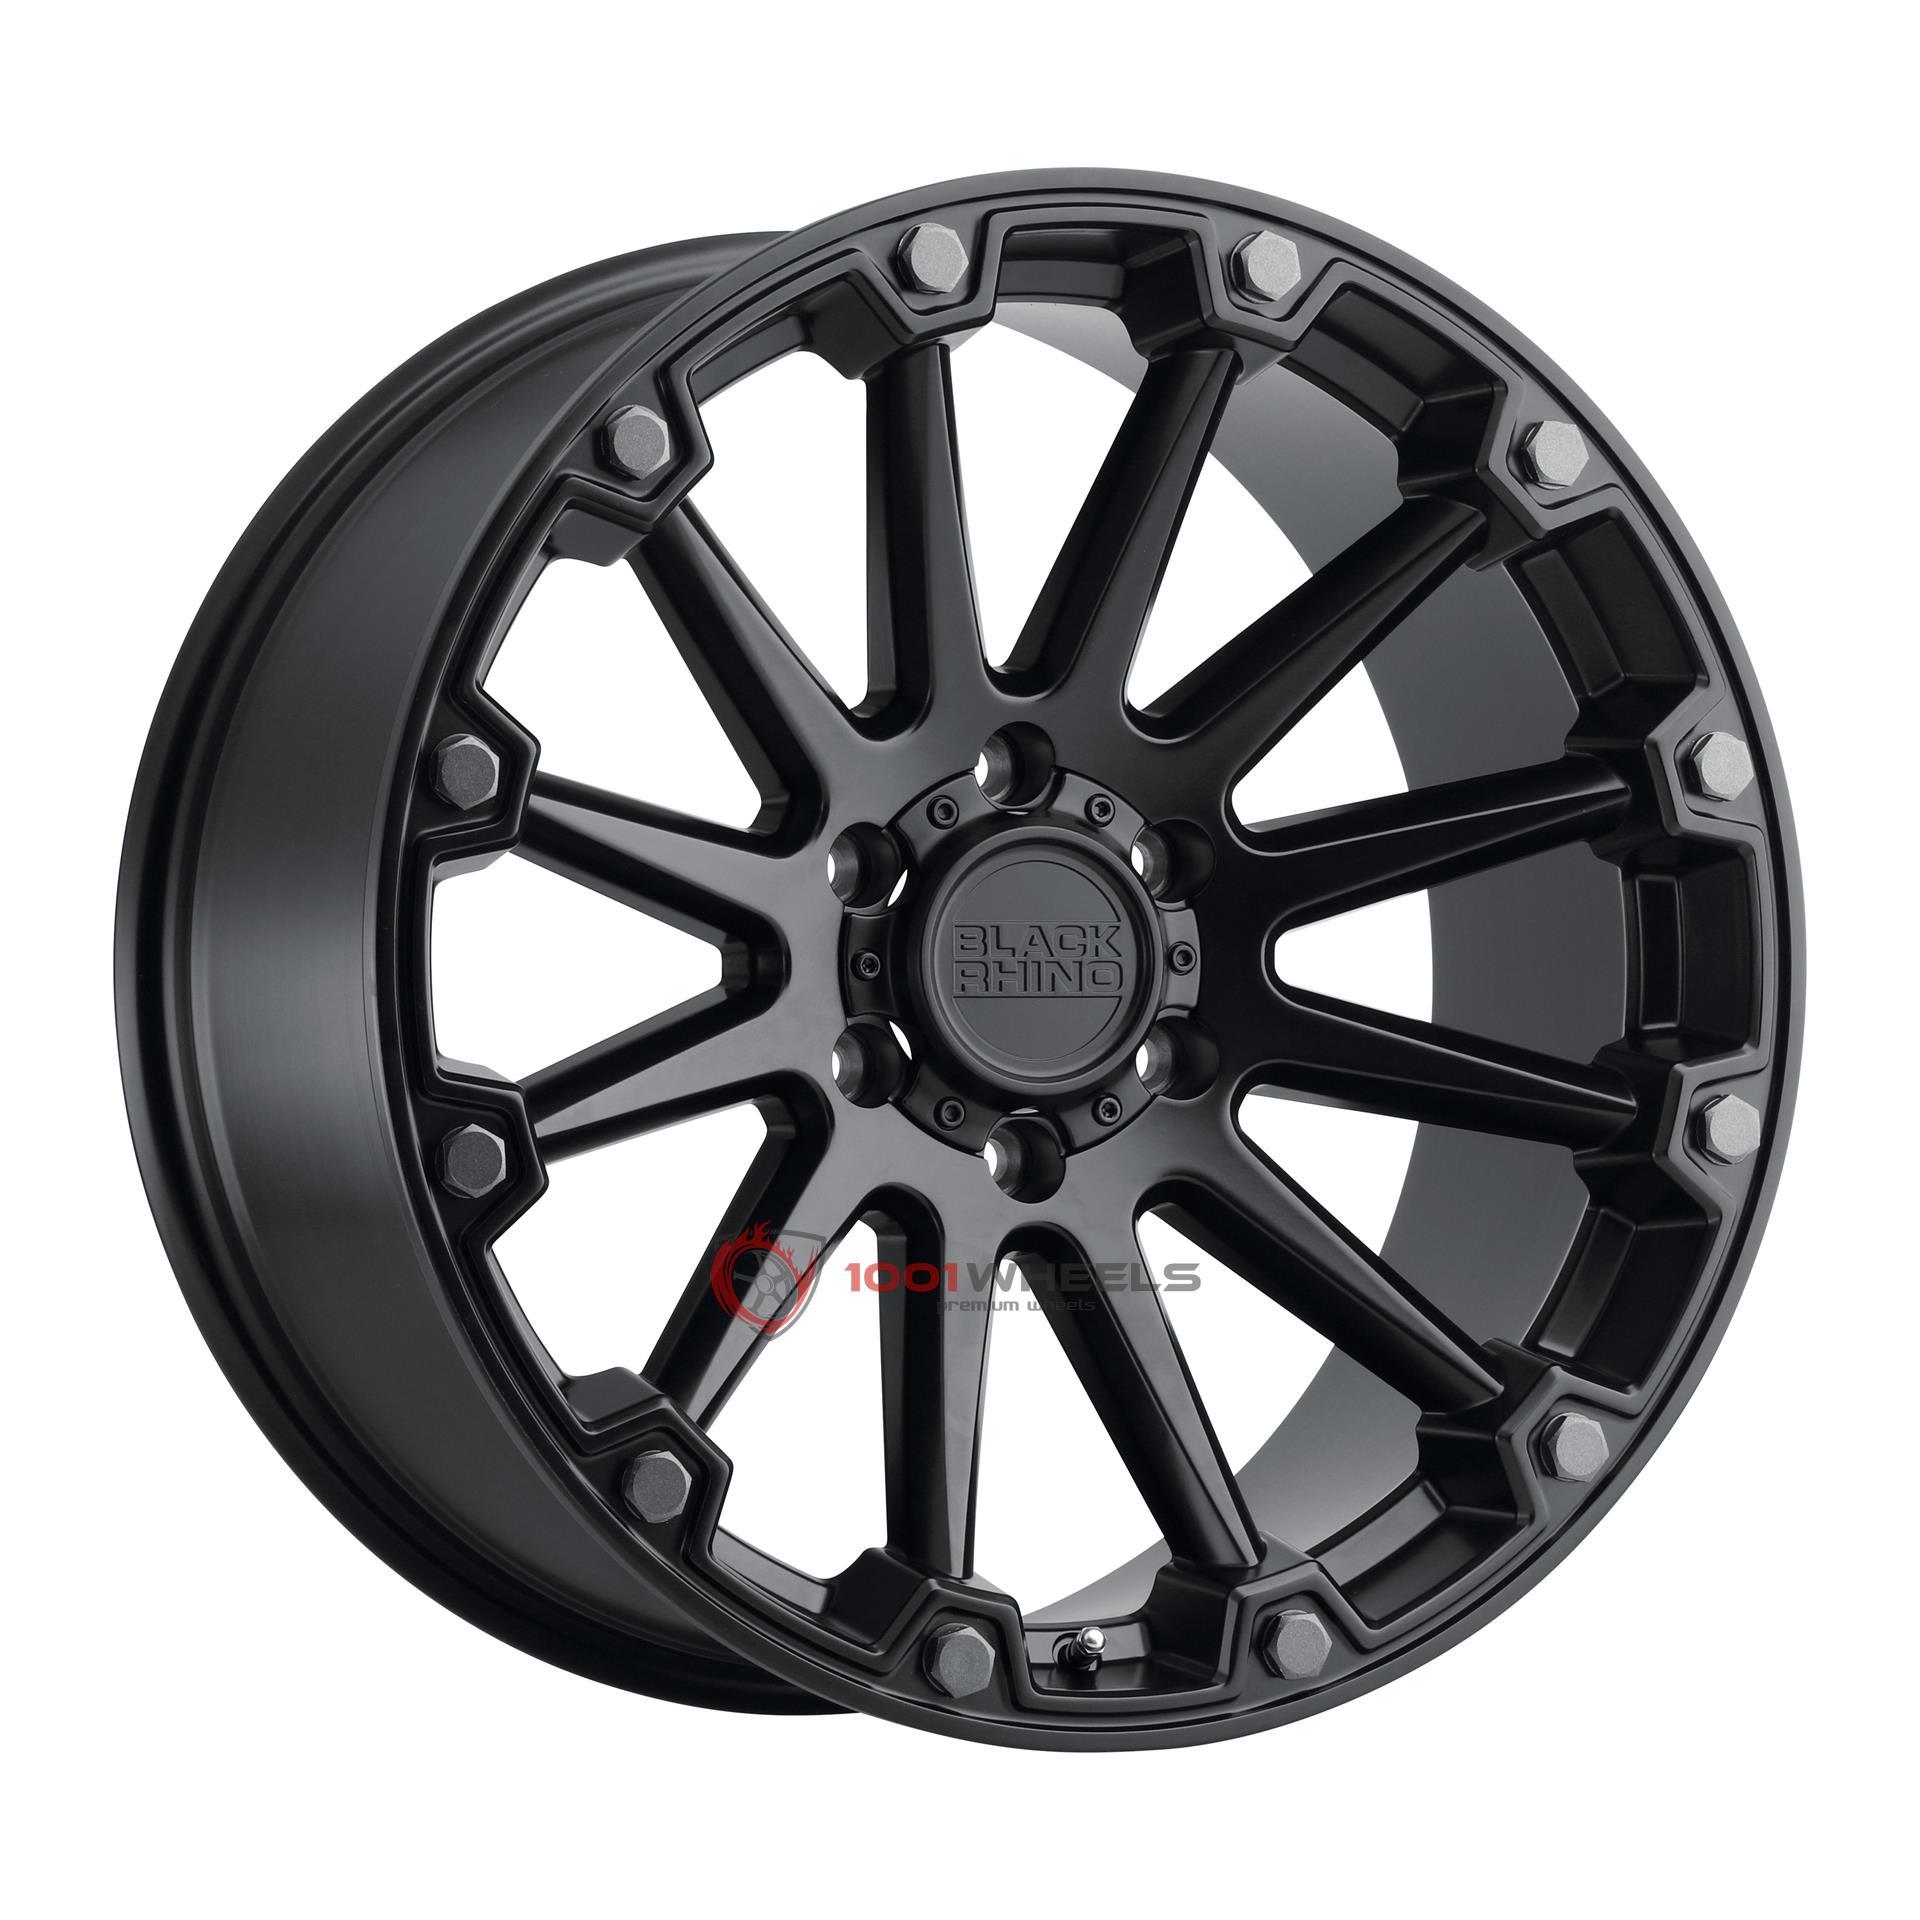 BLACK RHINO PINNACLE semi-gloss-black-wgunmetal-bolts